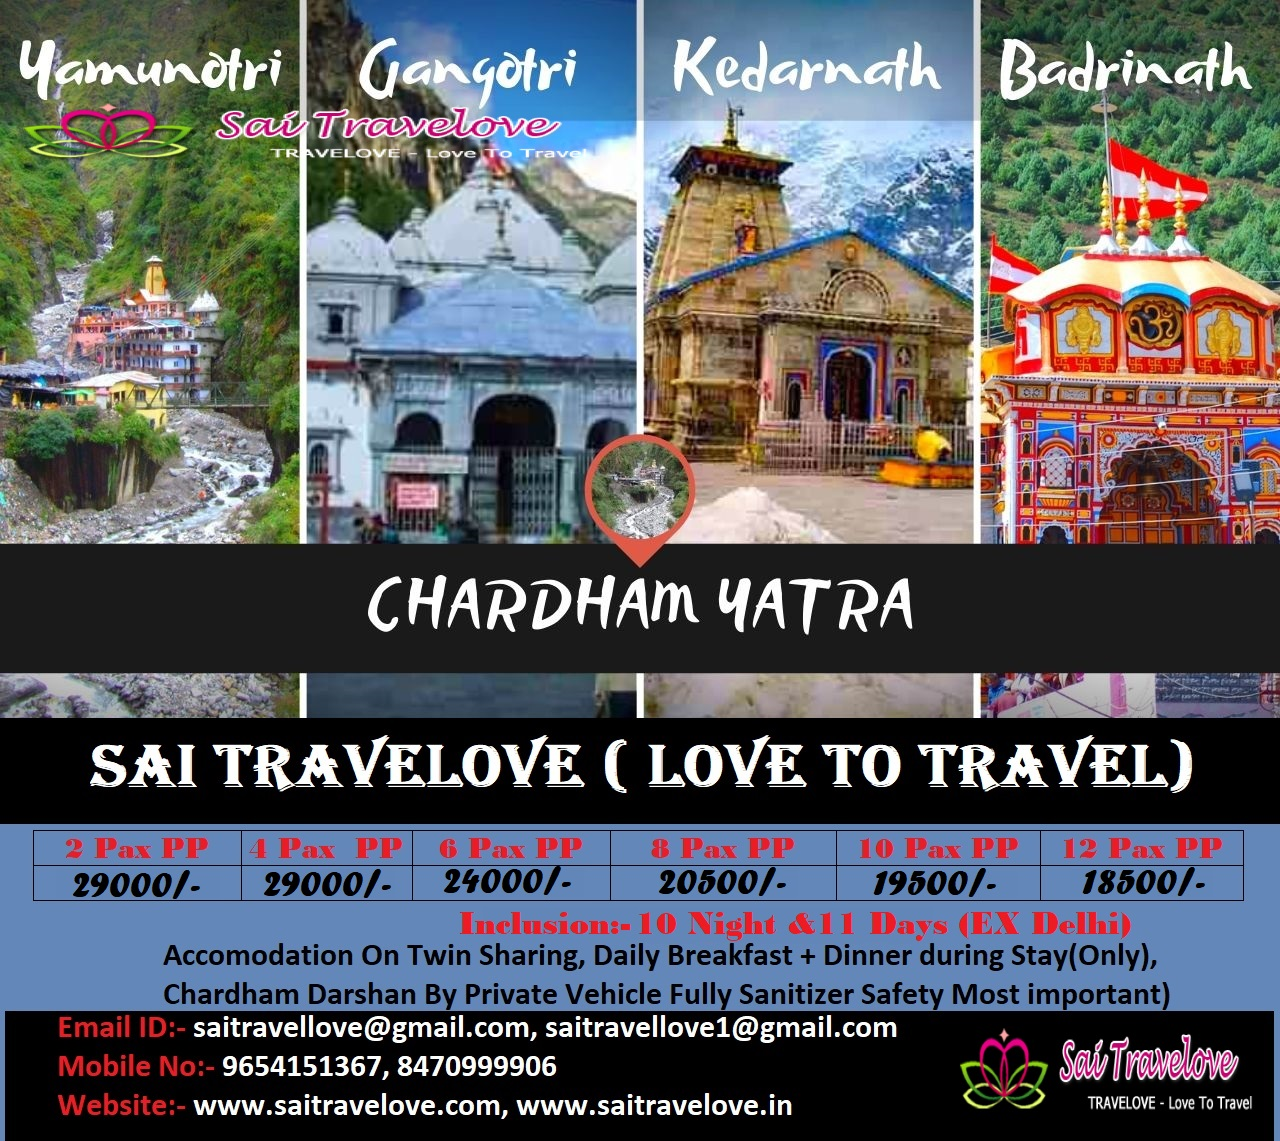 Sai Travelove